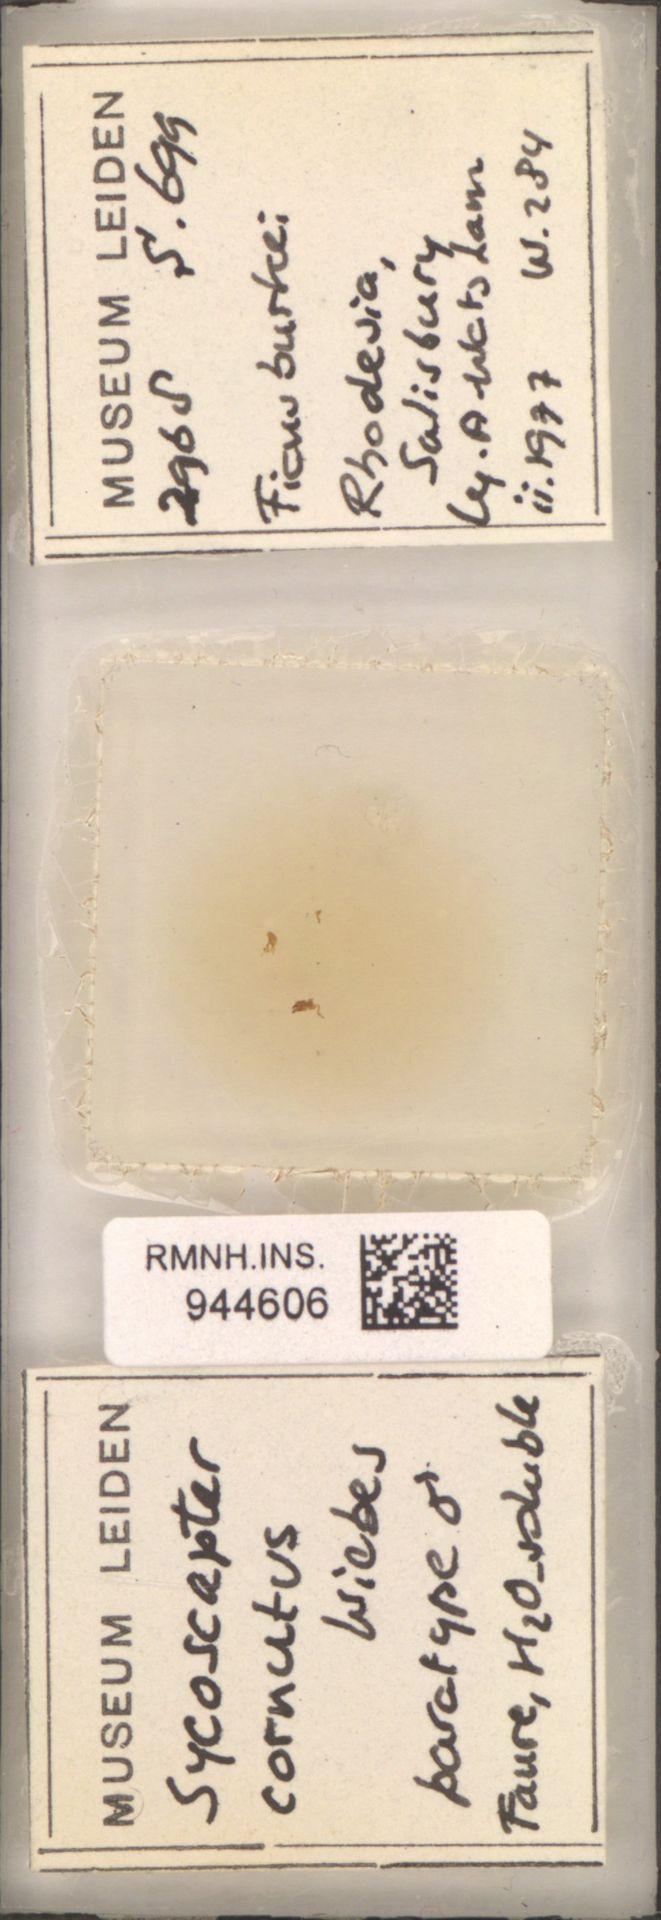 RMNH.INS.944606 | Sycoscapter cornutus Wiebes